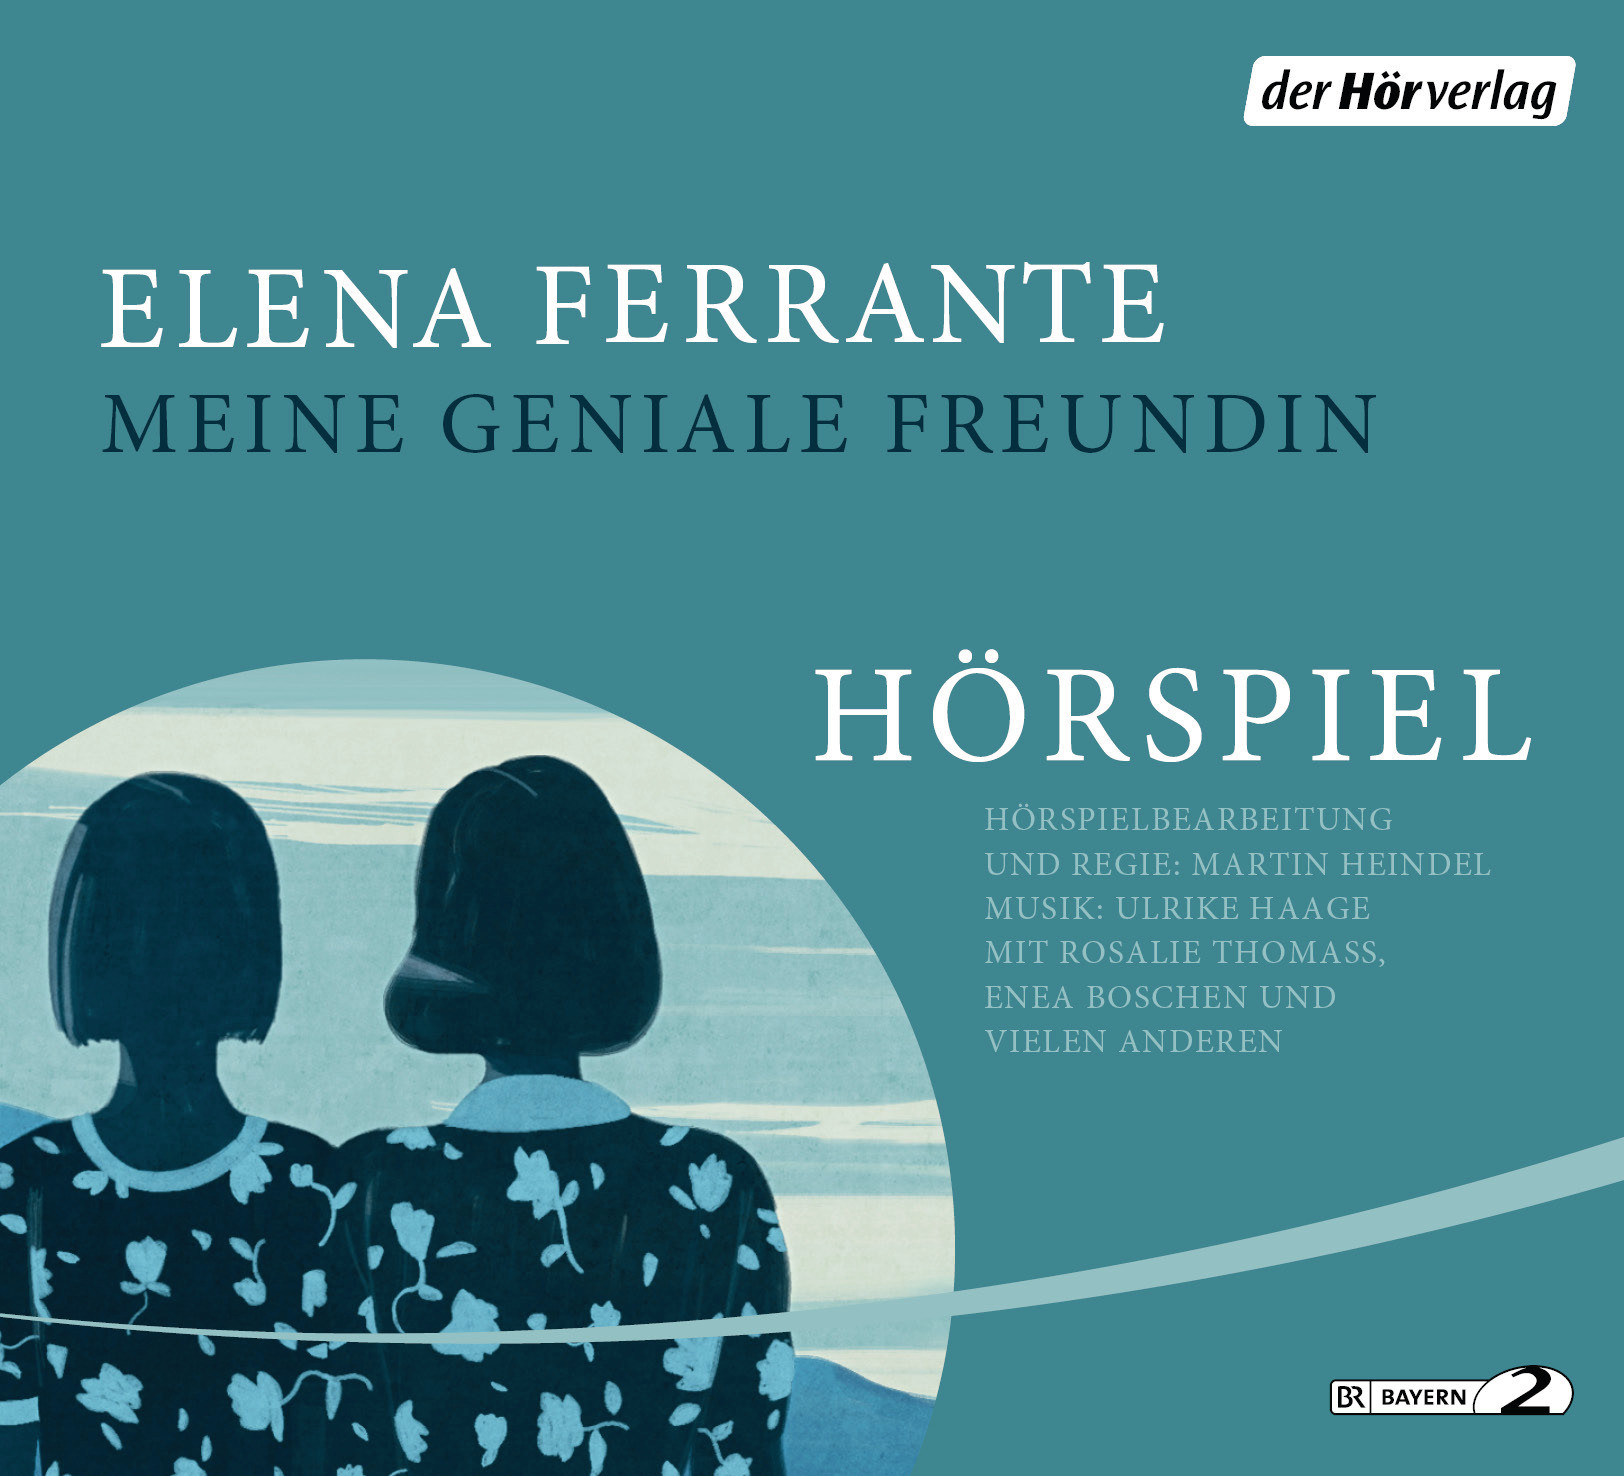 Elena Ferrante - Meine geniale Freundin - Das Hörspiel